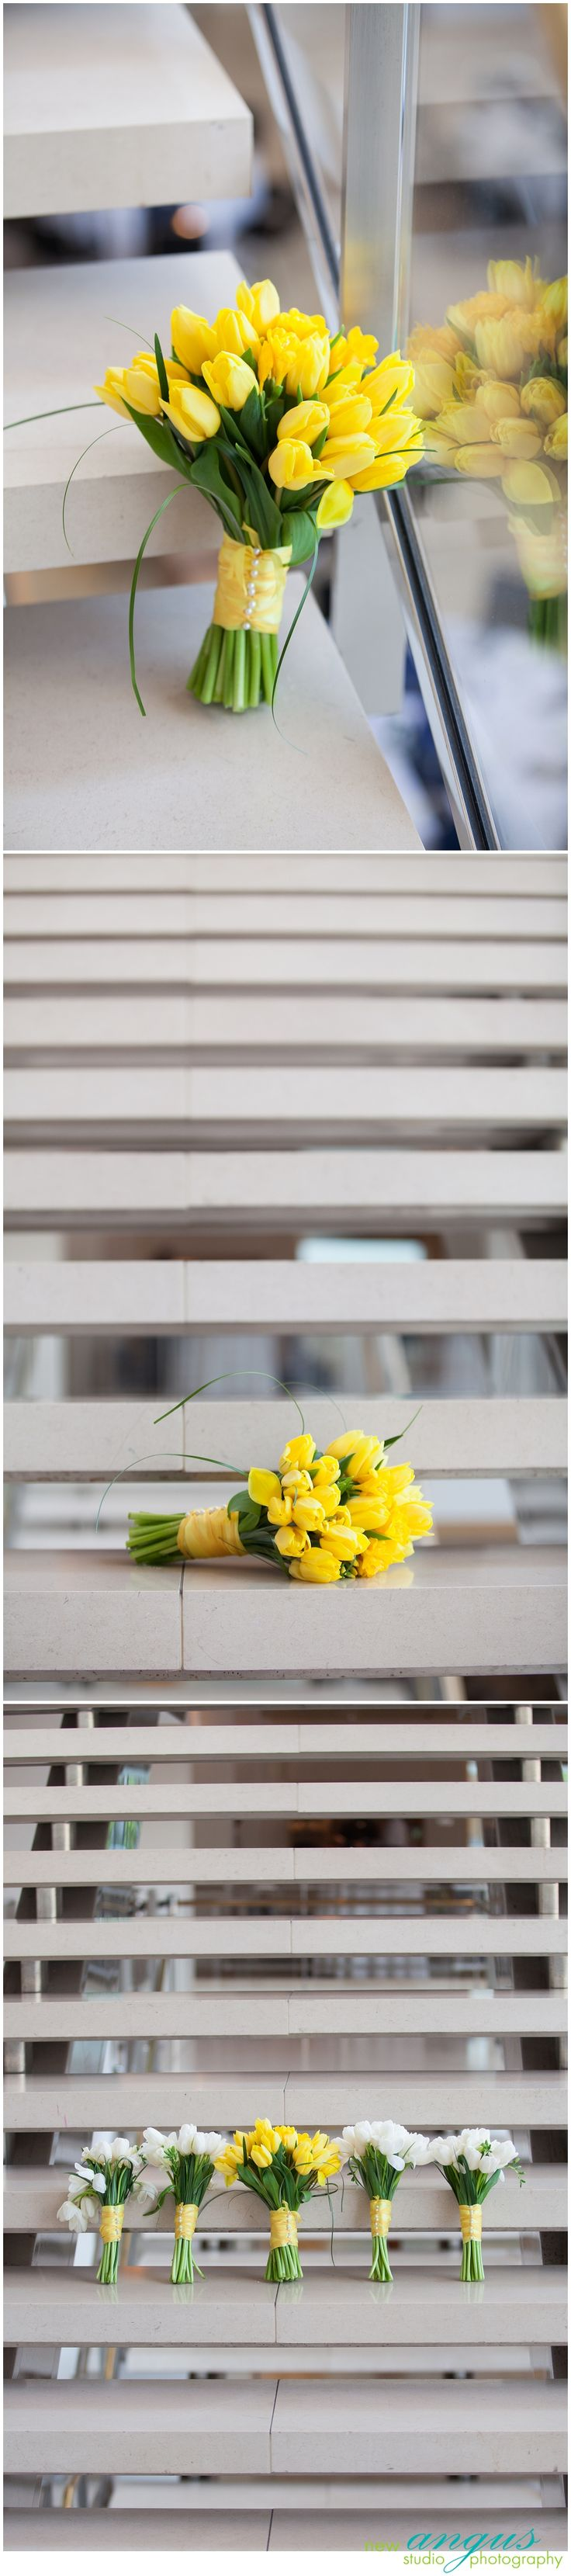 Buquê de casamento de tulipas amarelas.